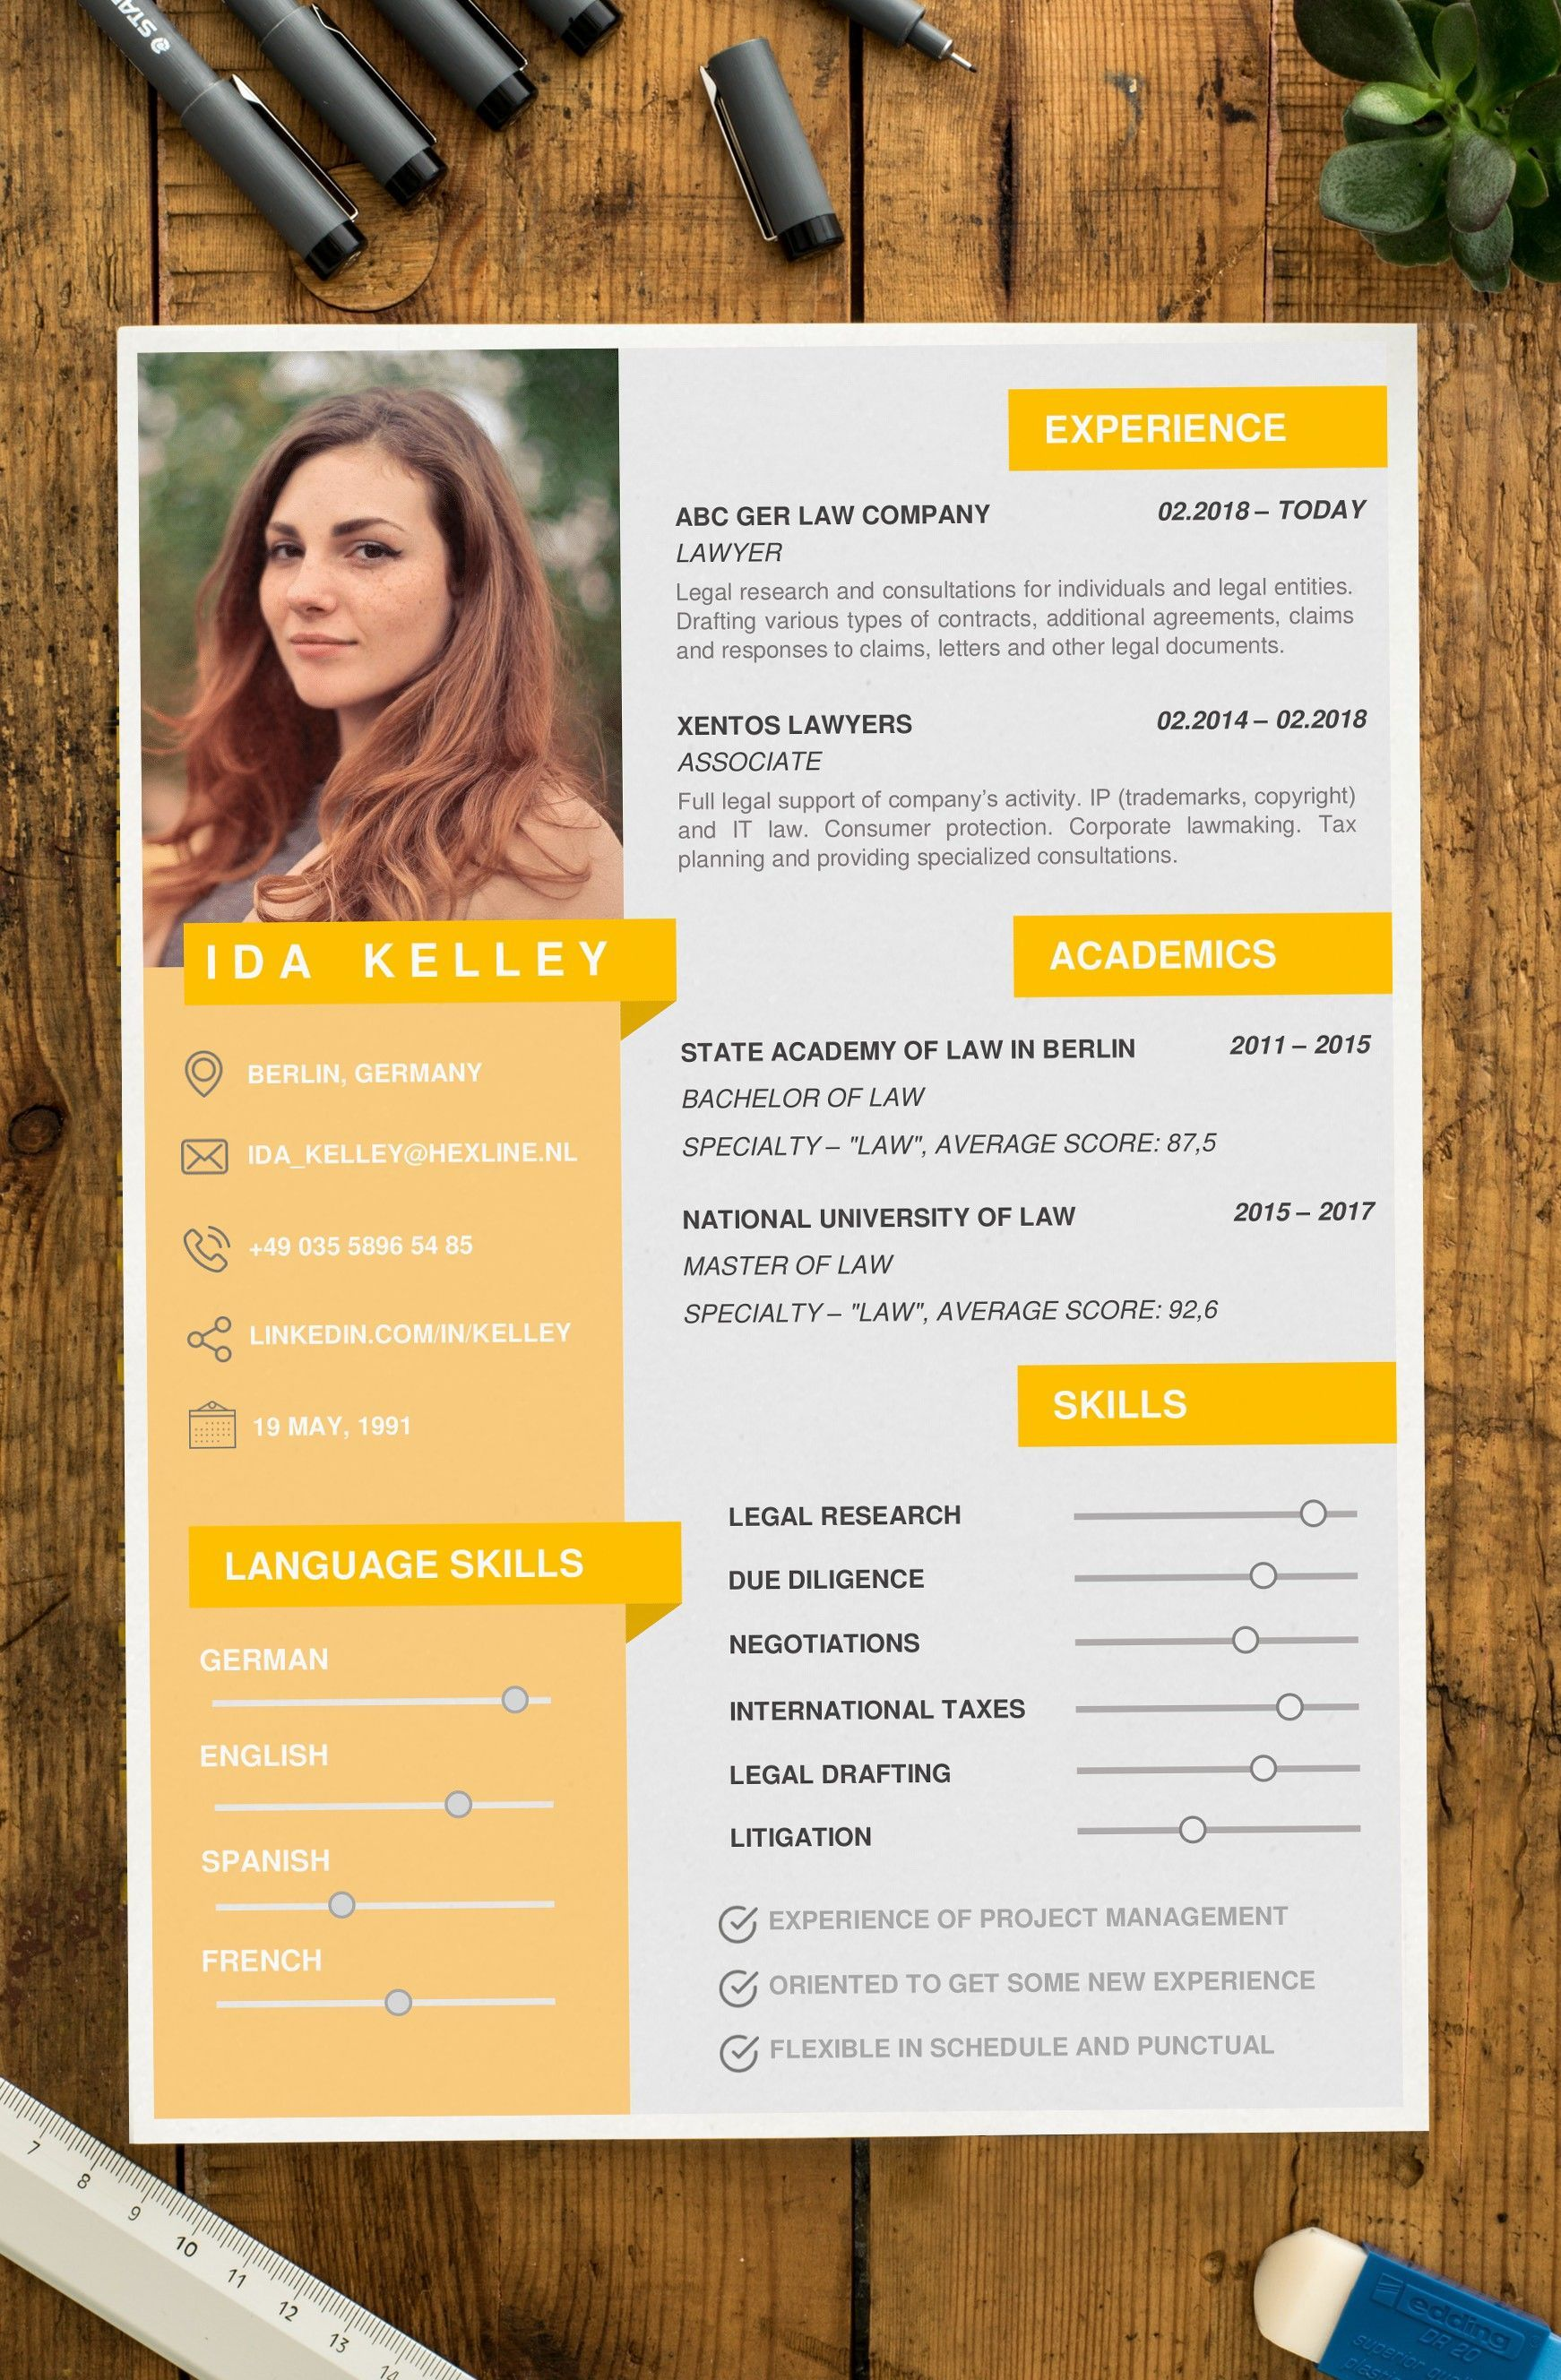 Ida Resume Cv Template For Word With Cover Letter In 2021 Cv Design Creative Cv Design Template Free Resume Design Creative